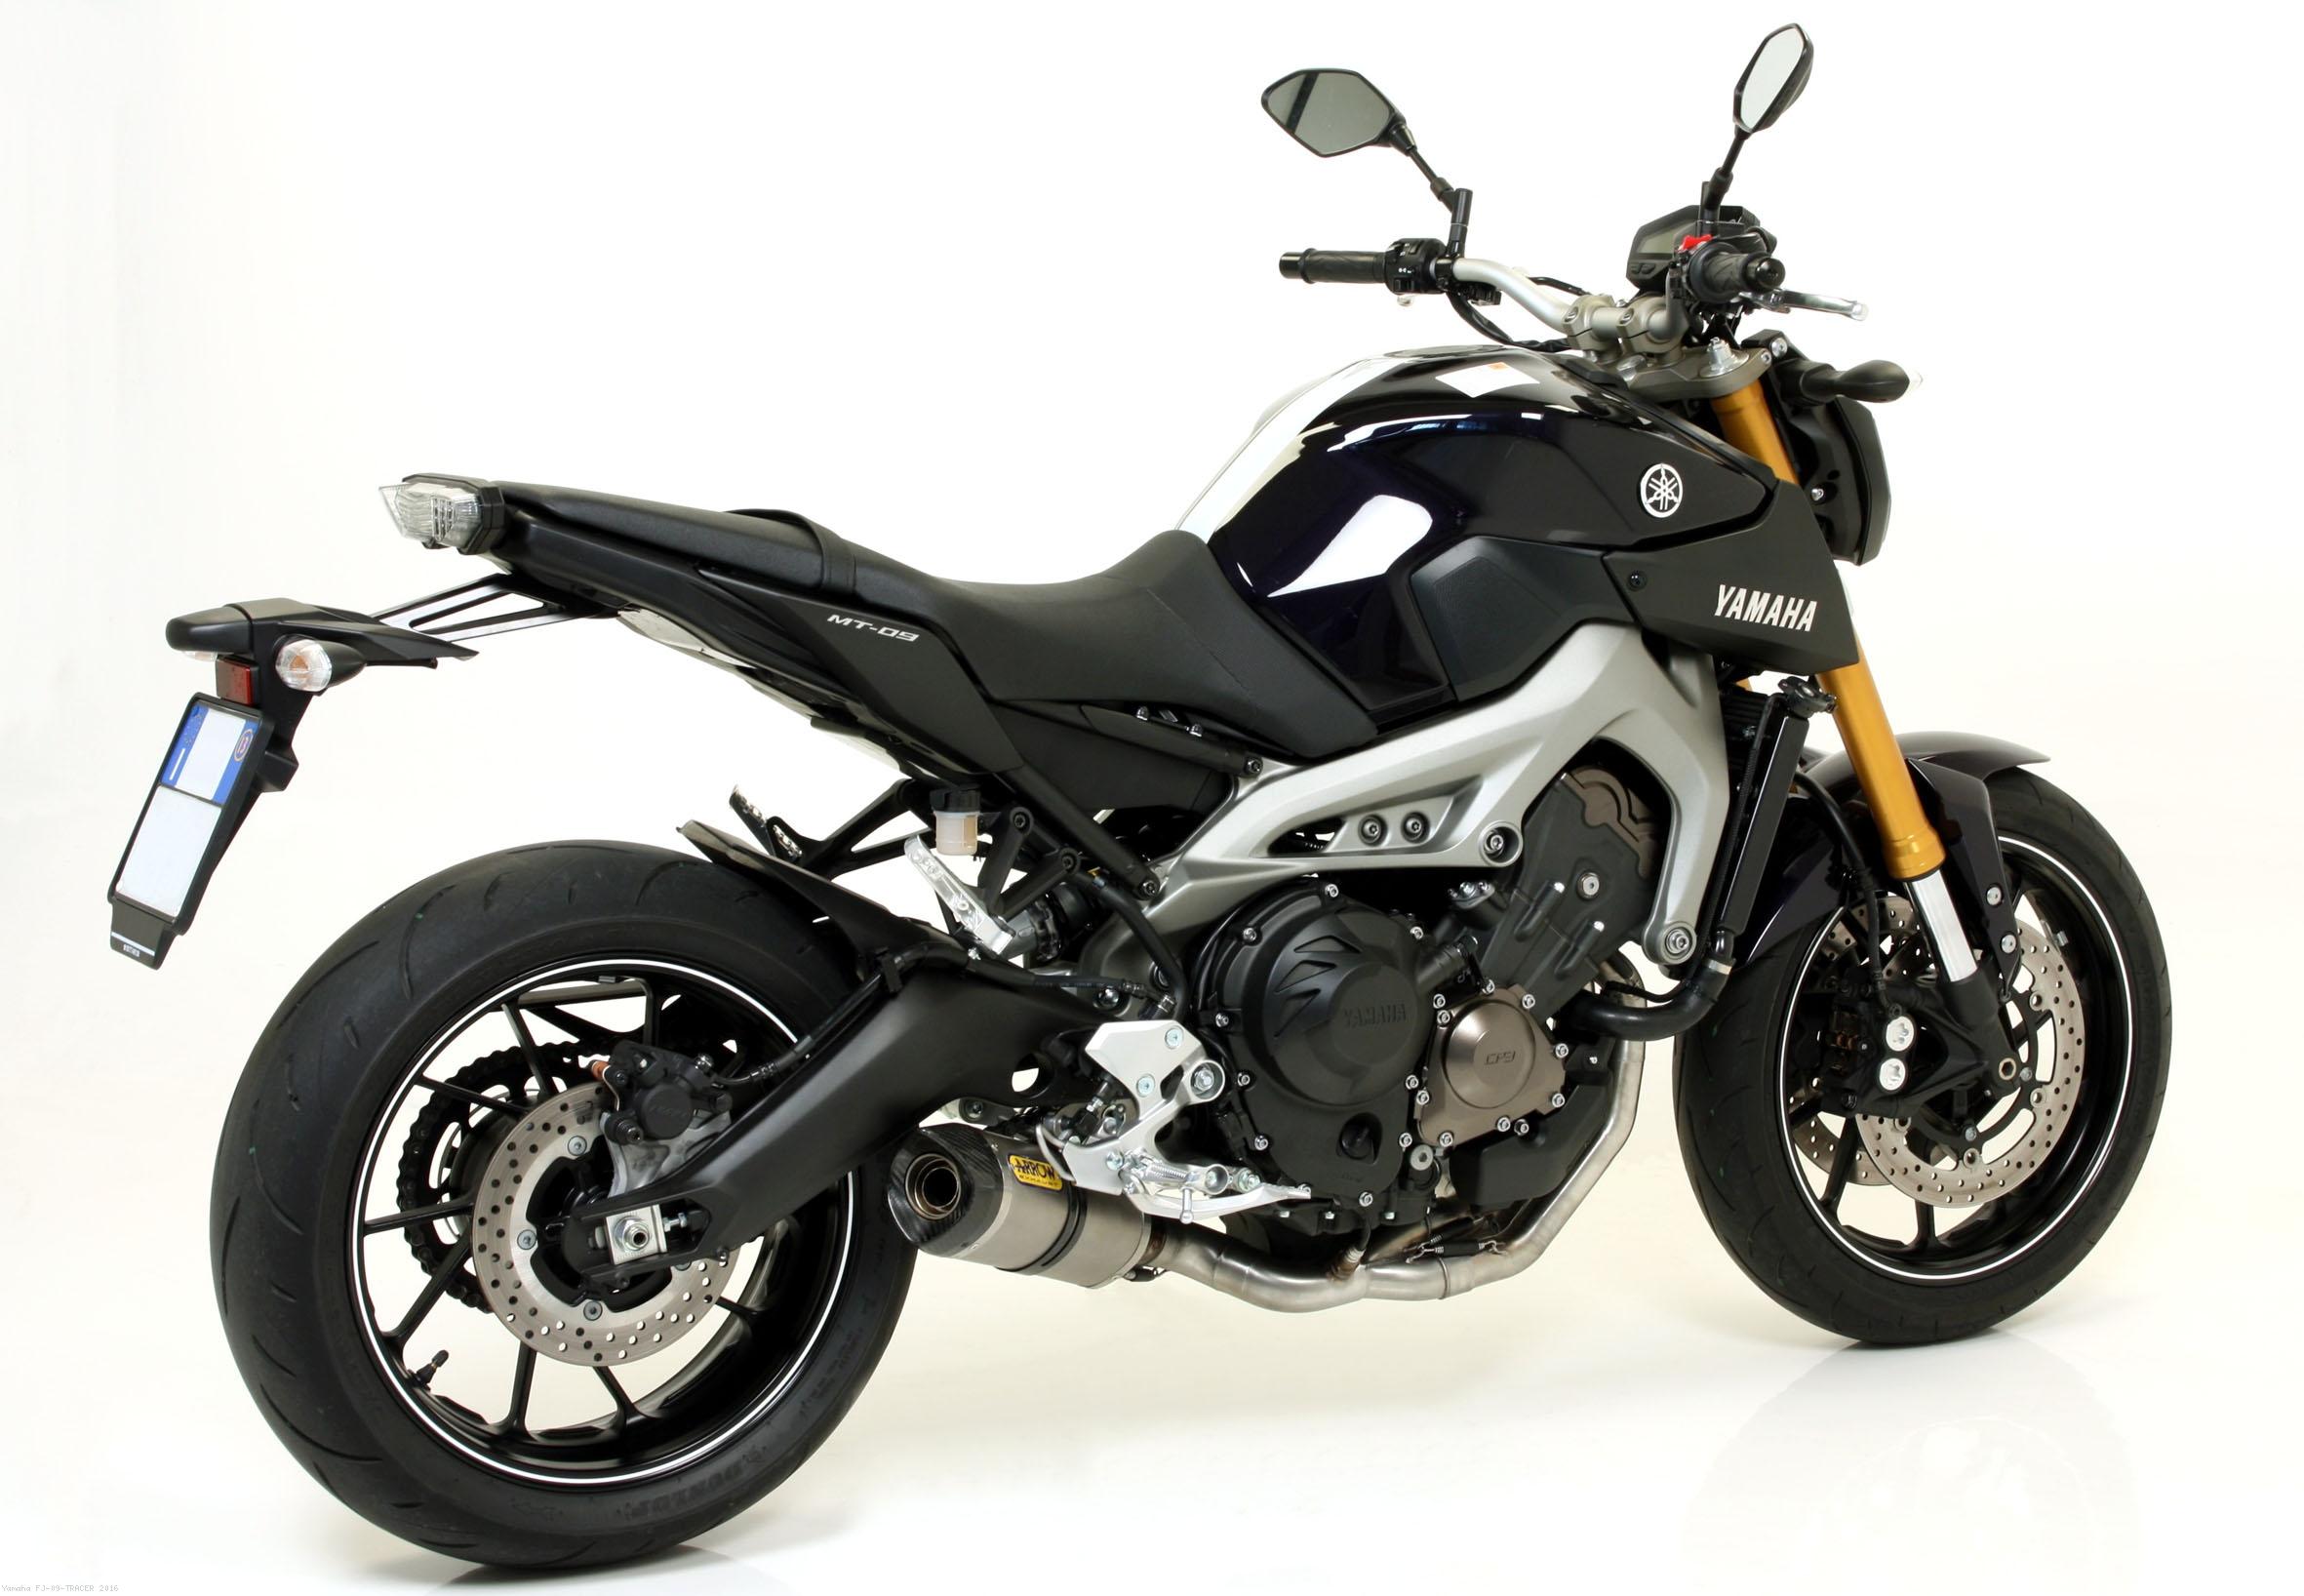 Street Thunder Full Exhaust System By Arrow Yamaha Fj 09 Tracer